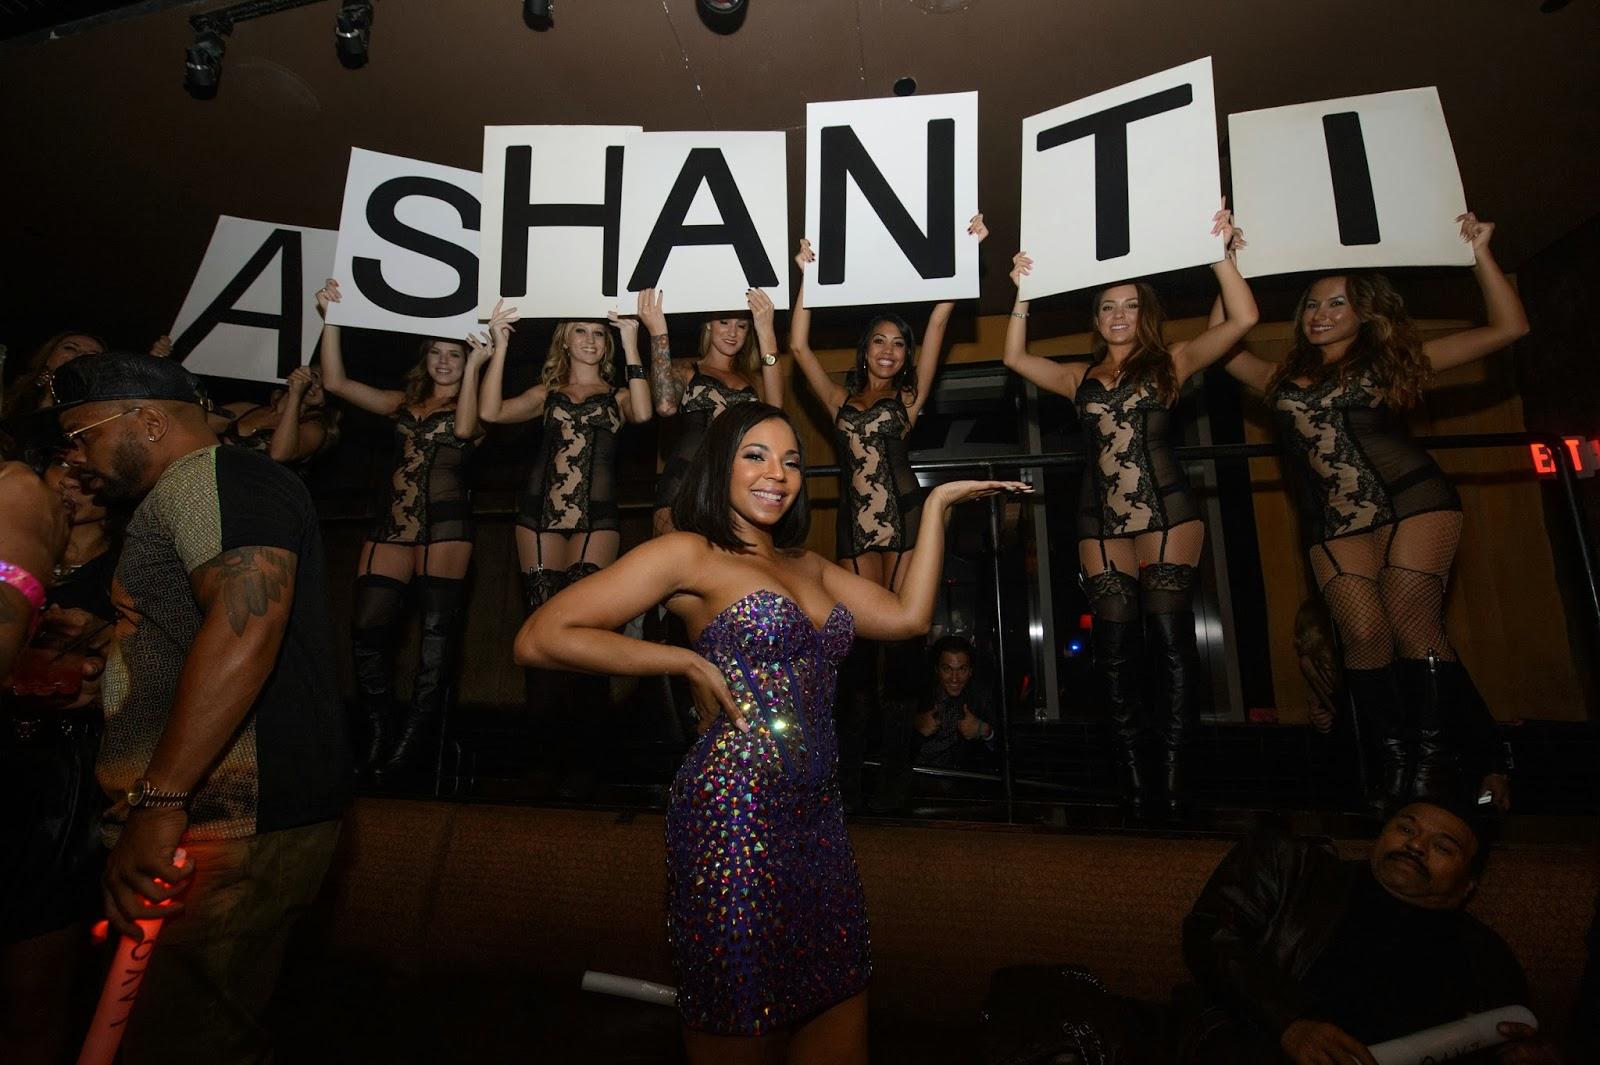 Ashanti at LAVO Las Vegas